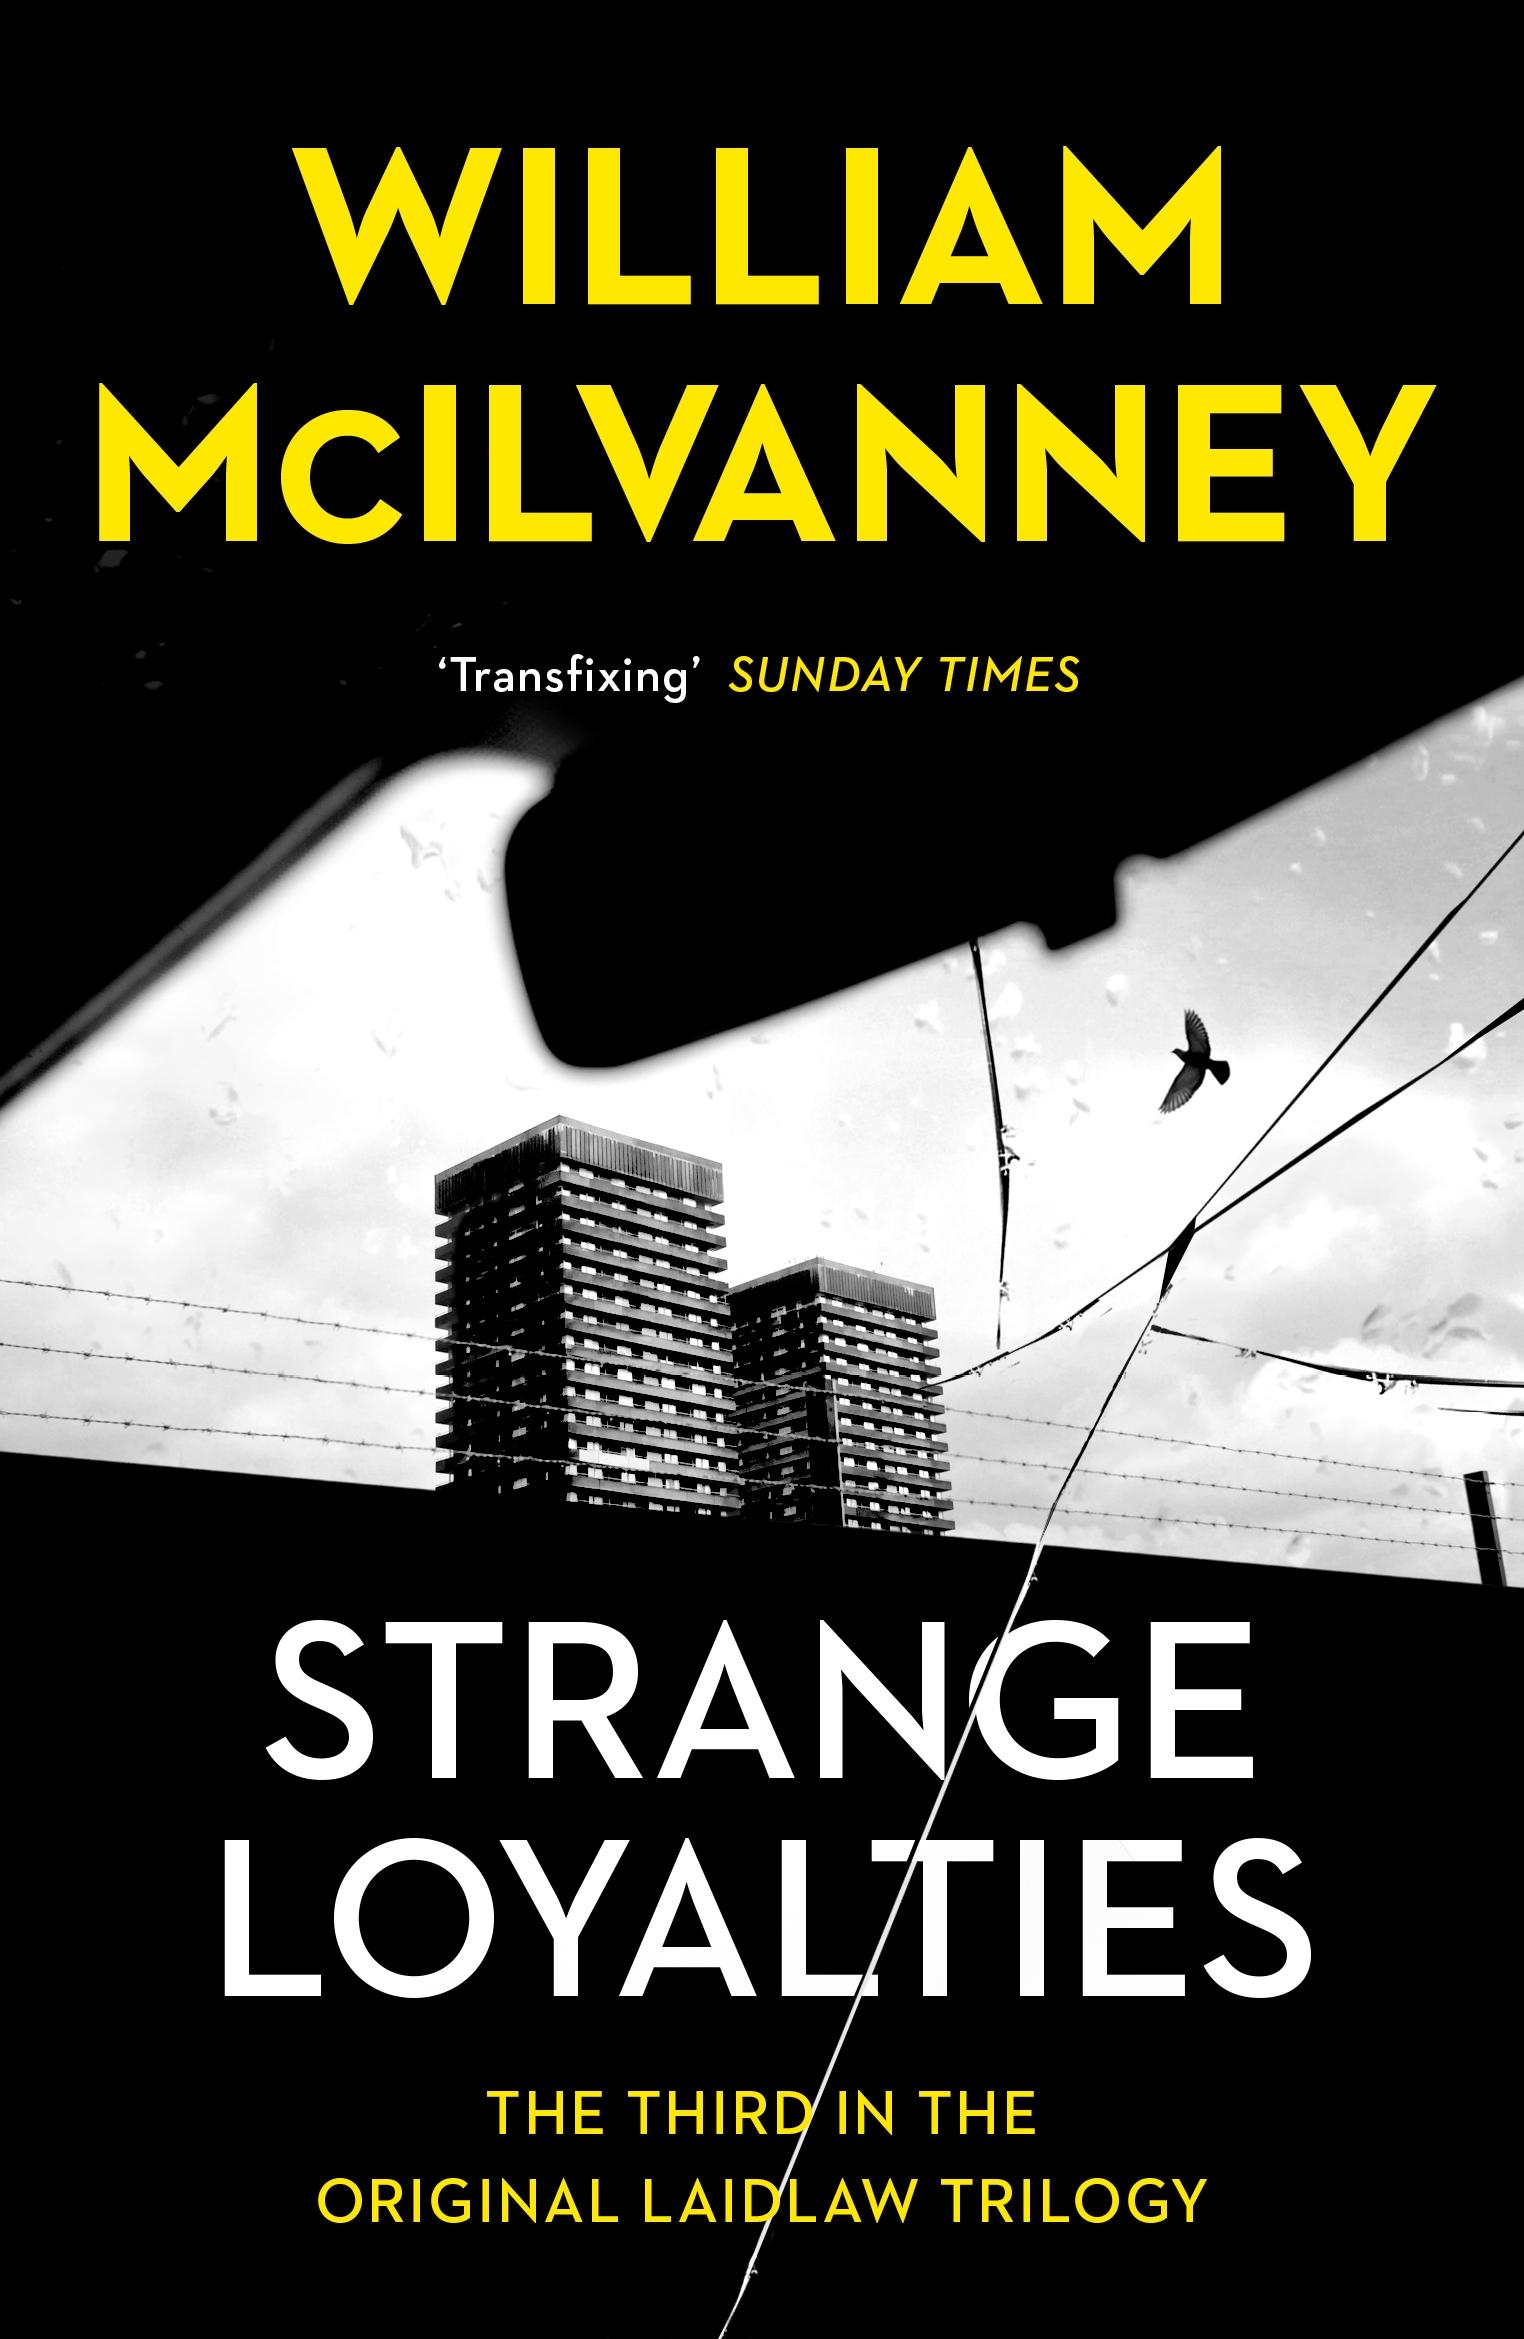 Strange Loyalties by William McIlvanney paperback cover